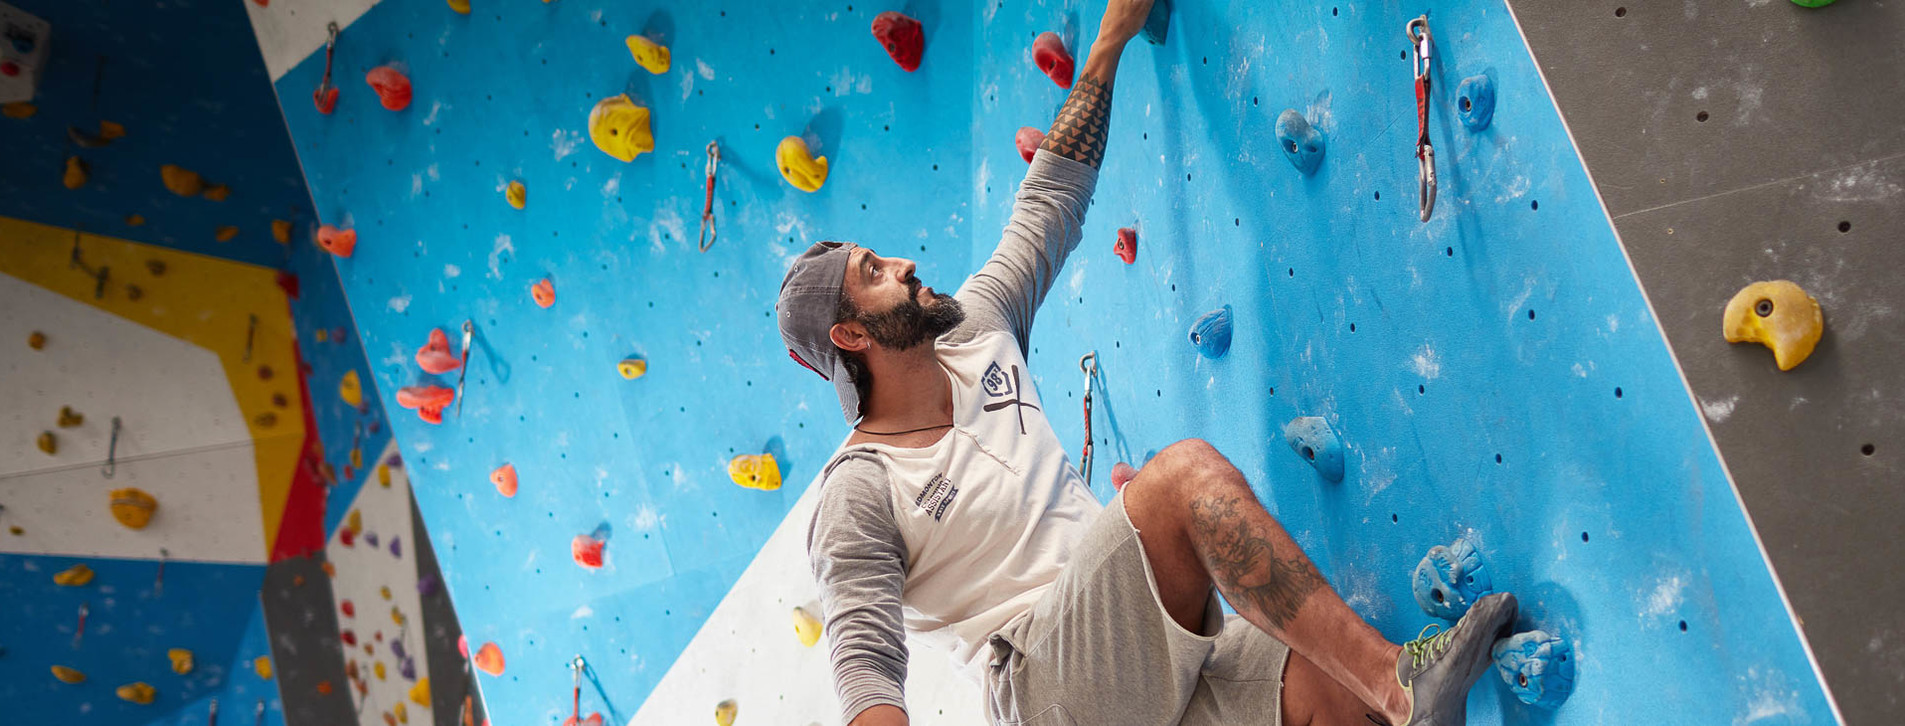 Фото - Урок альпинизма на скалодроме